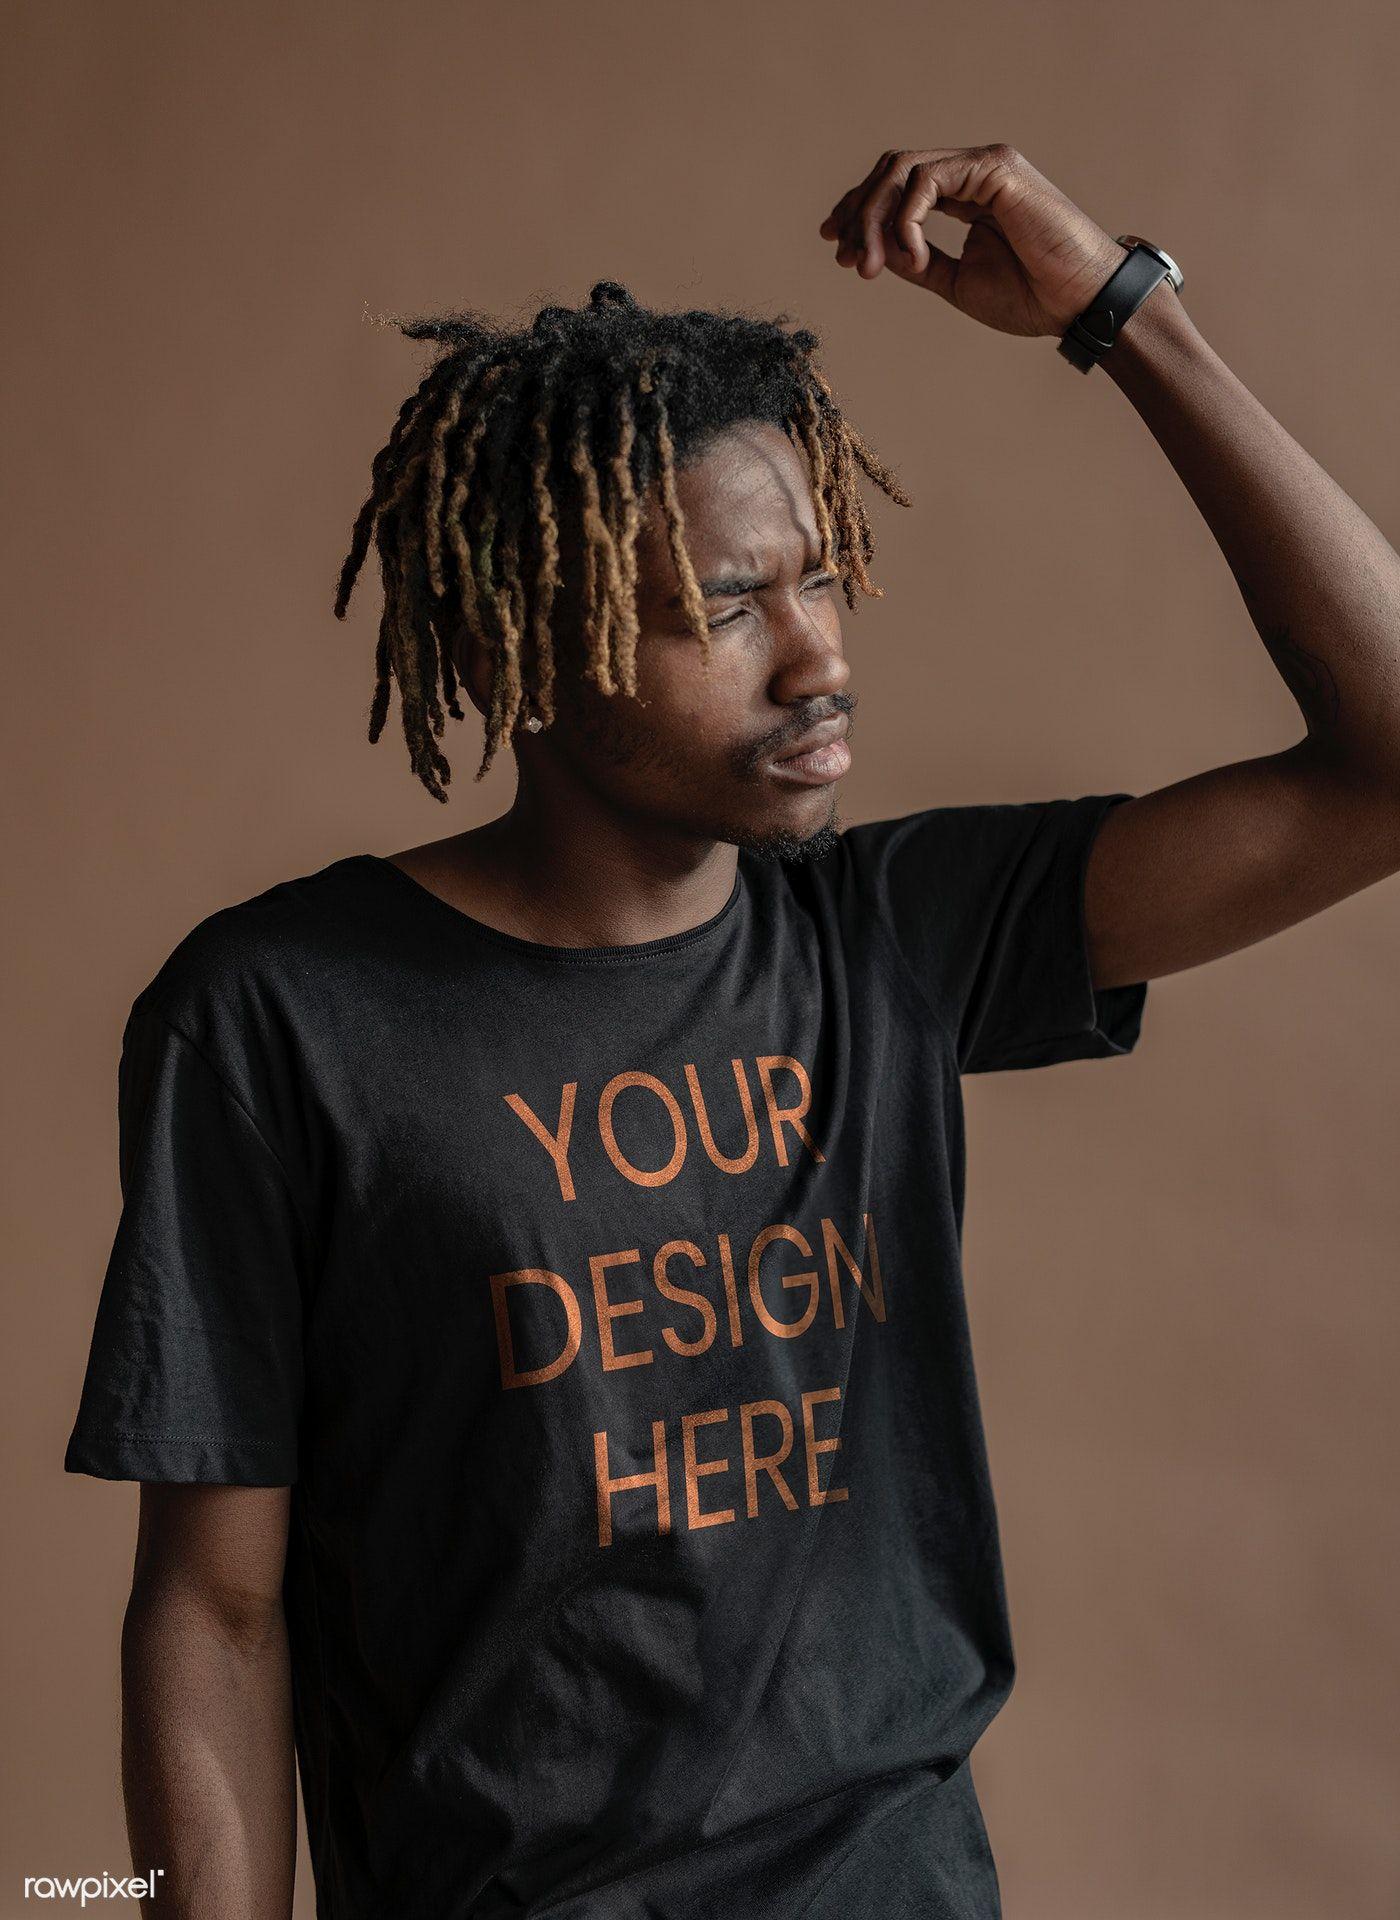 Download Download Premium Psd Of Black Man Wearing A T Shirt Mockup 1213816 Shirt Mockup Tshirt Mockup Mockup